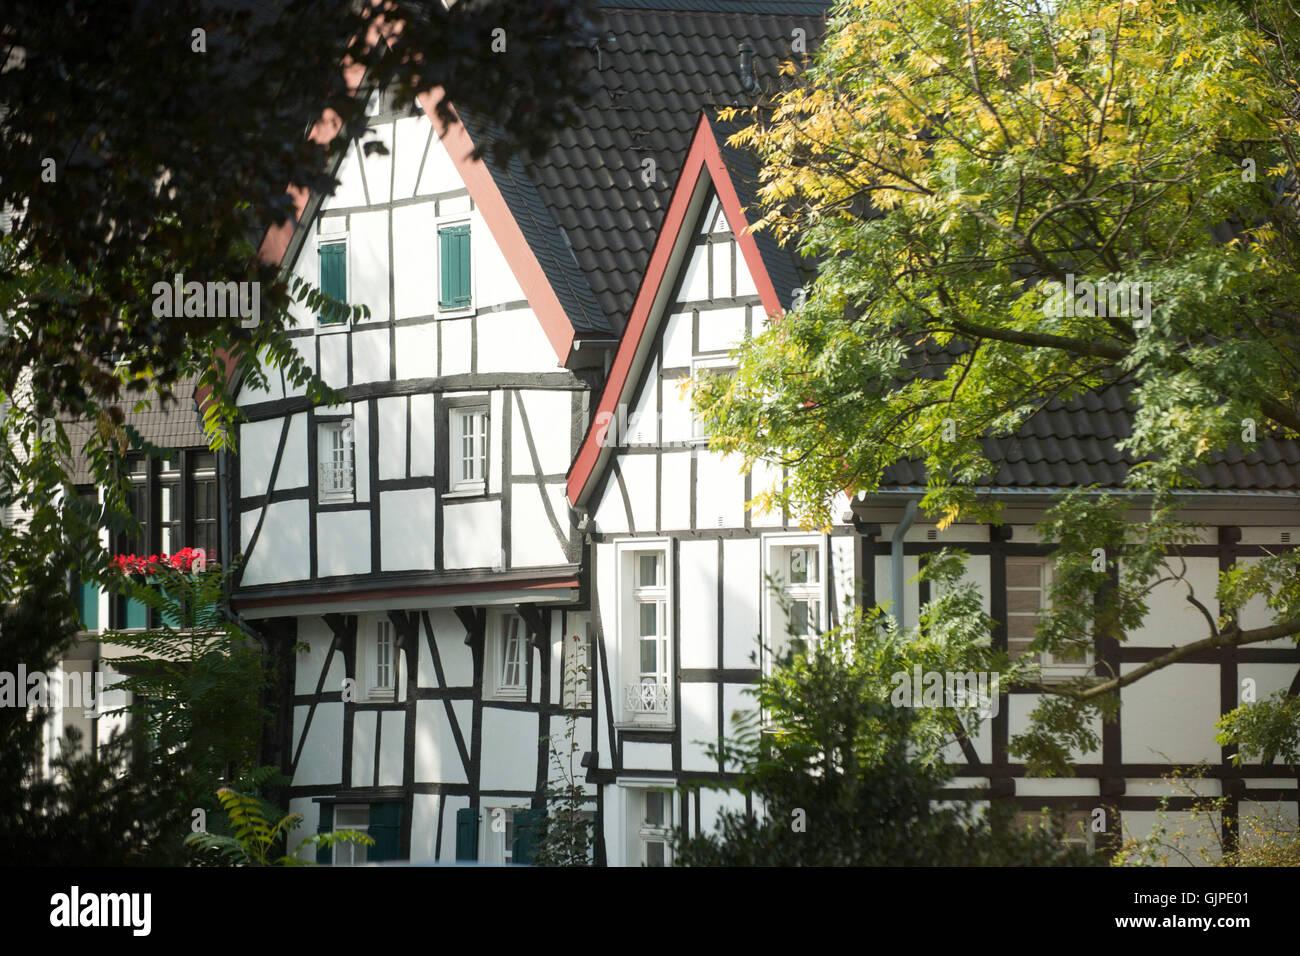 Fachwerkhäuser D Stock Photos & Fachwerkhäuser D Stock Images - Alamy